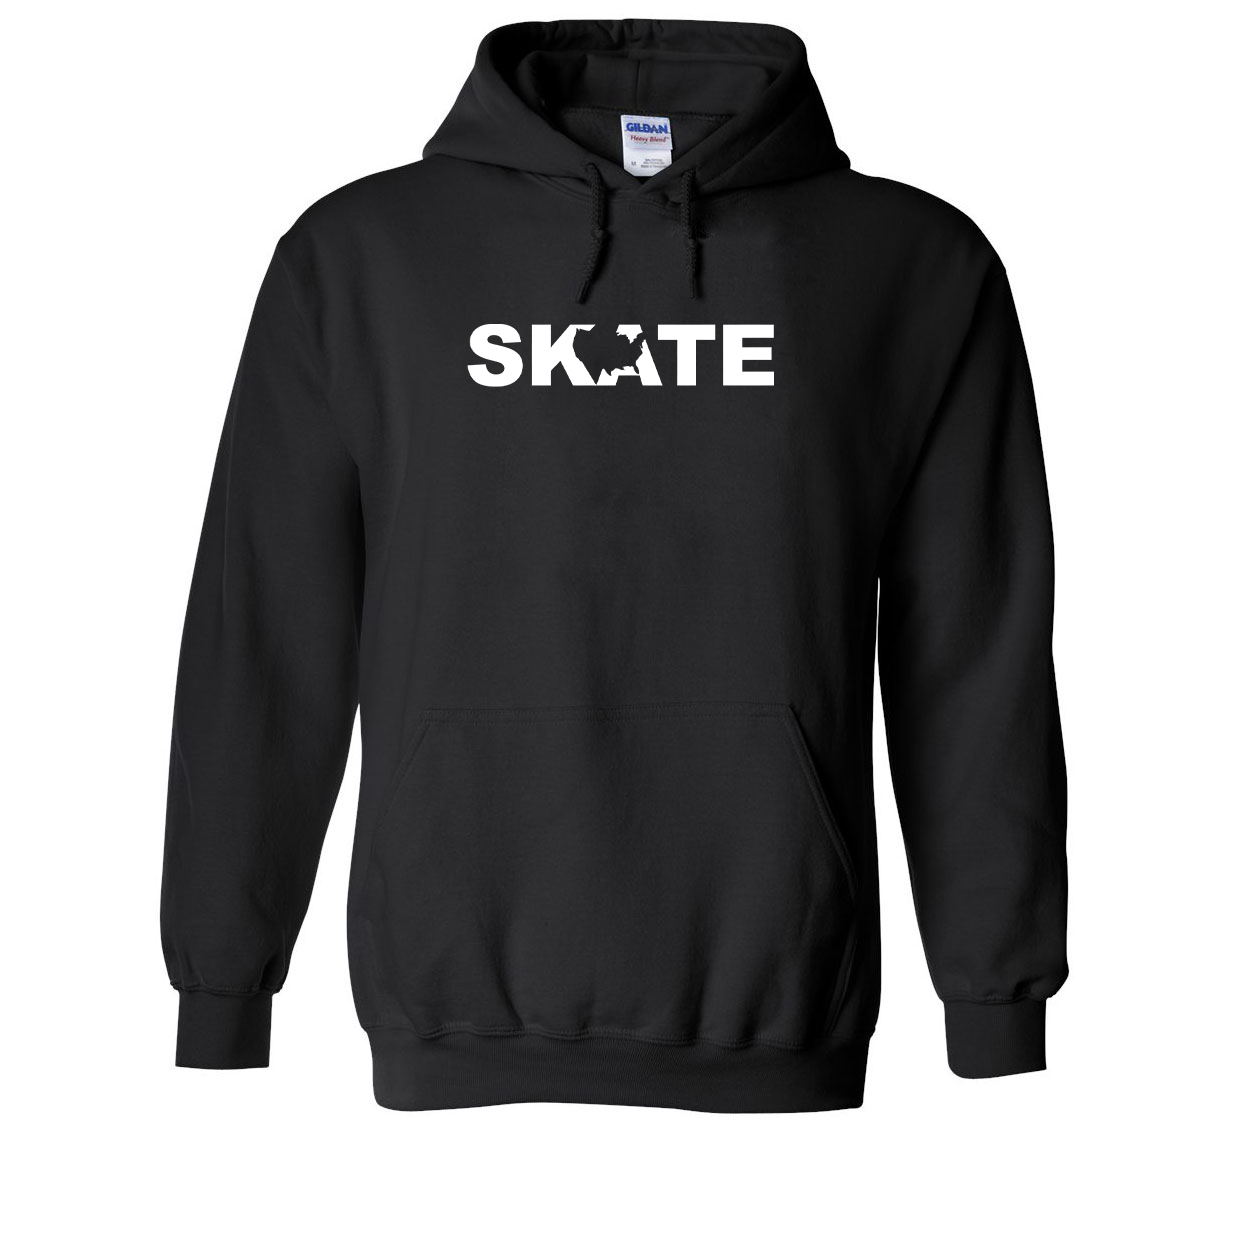 Skate United States Classic Sweatshirt Black (White Logo)